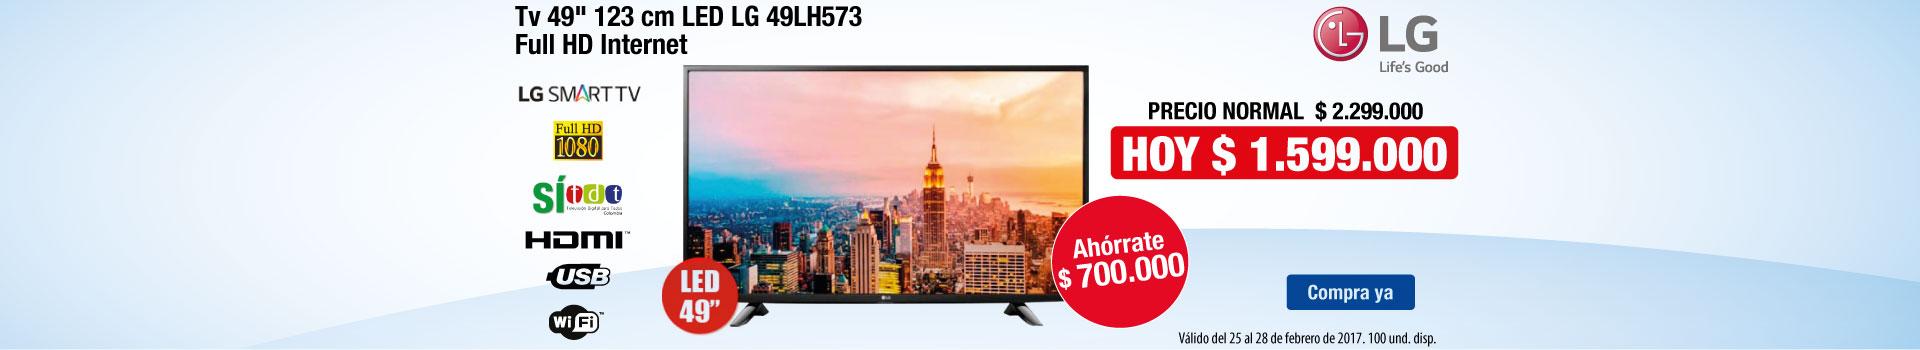 OPC KT- TV LG 49LH - Feb 25